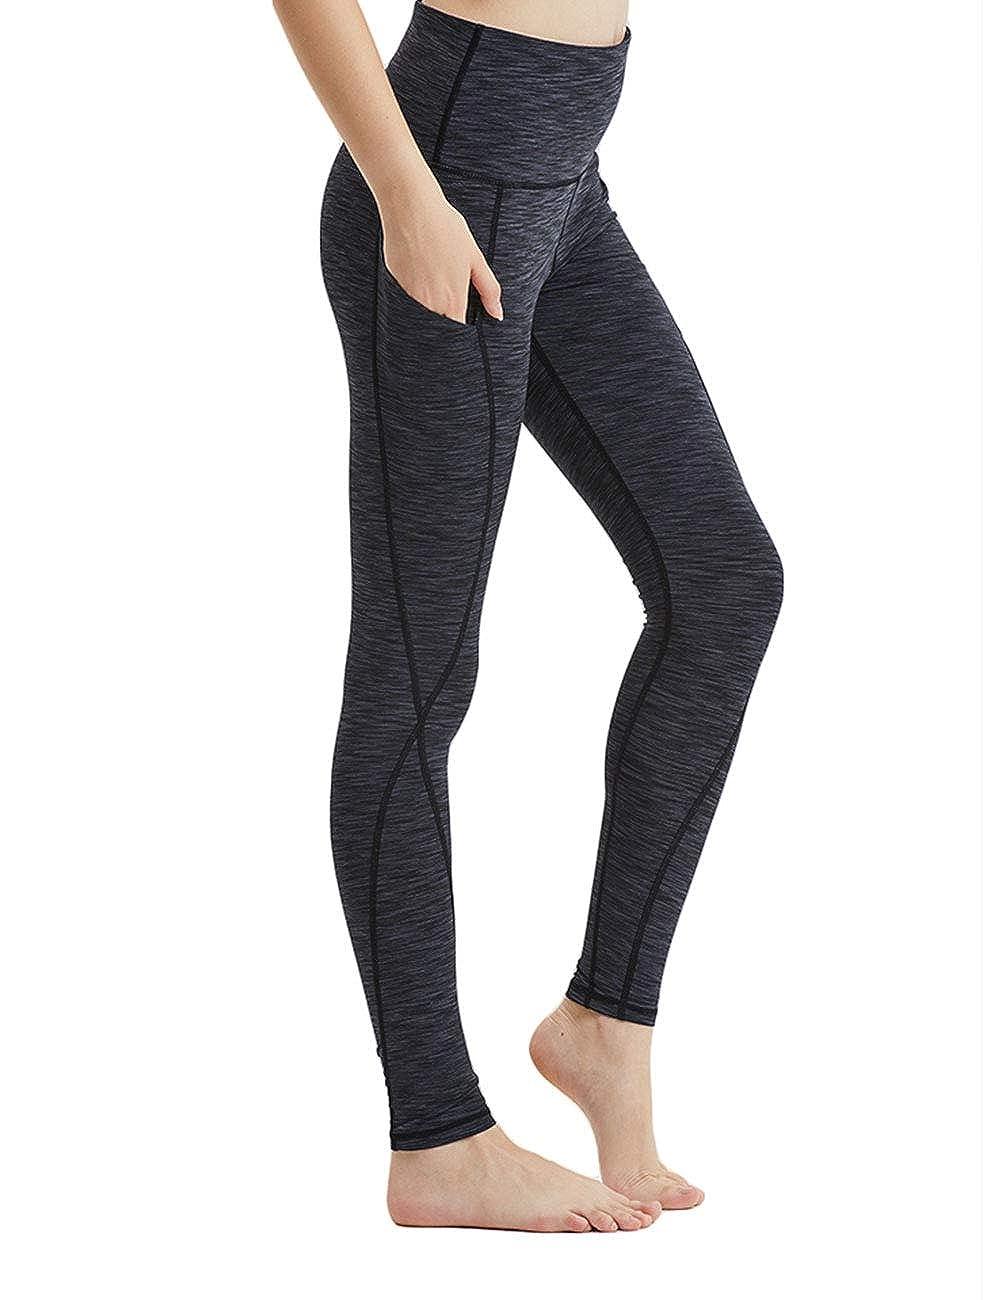 Black XReborn Women's High Waist Yoga Gym Workout Pants Side Pockets Non SeeThrough Leggings